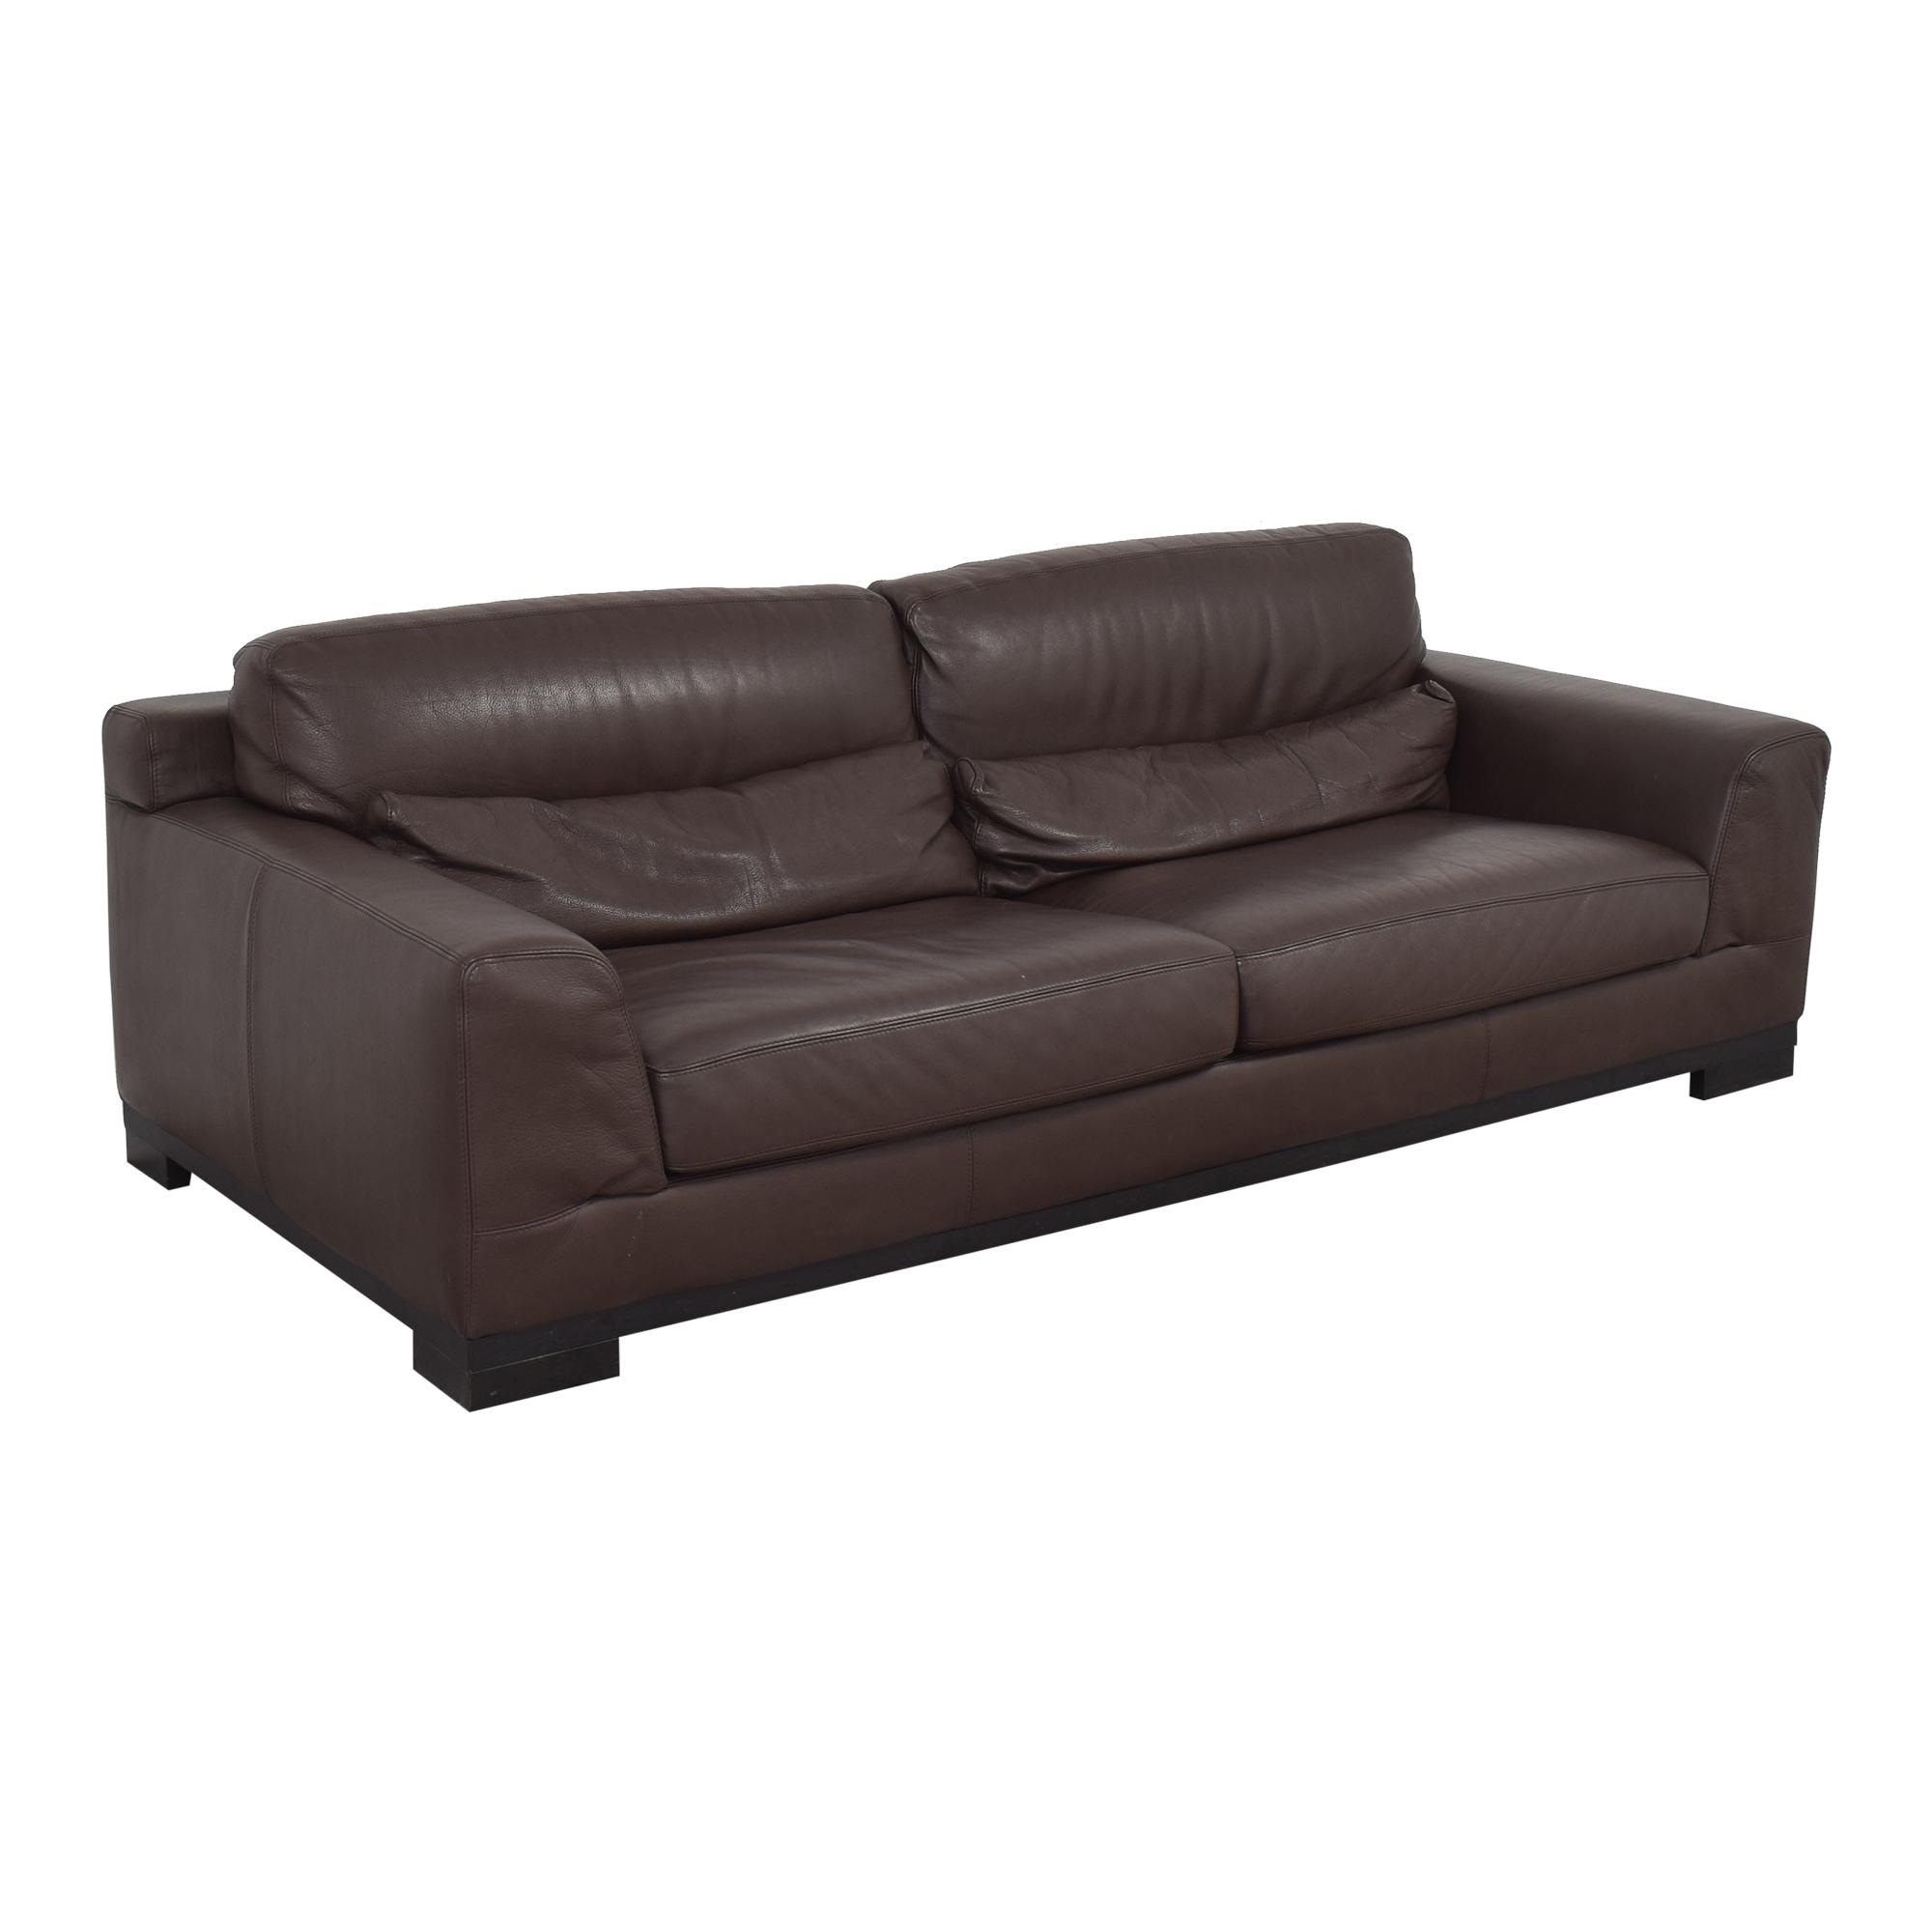 Natuzzi Editions Leather Sofa / Sofas